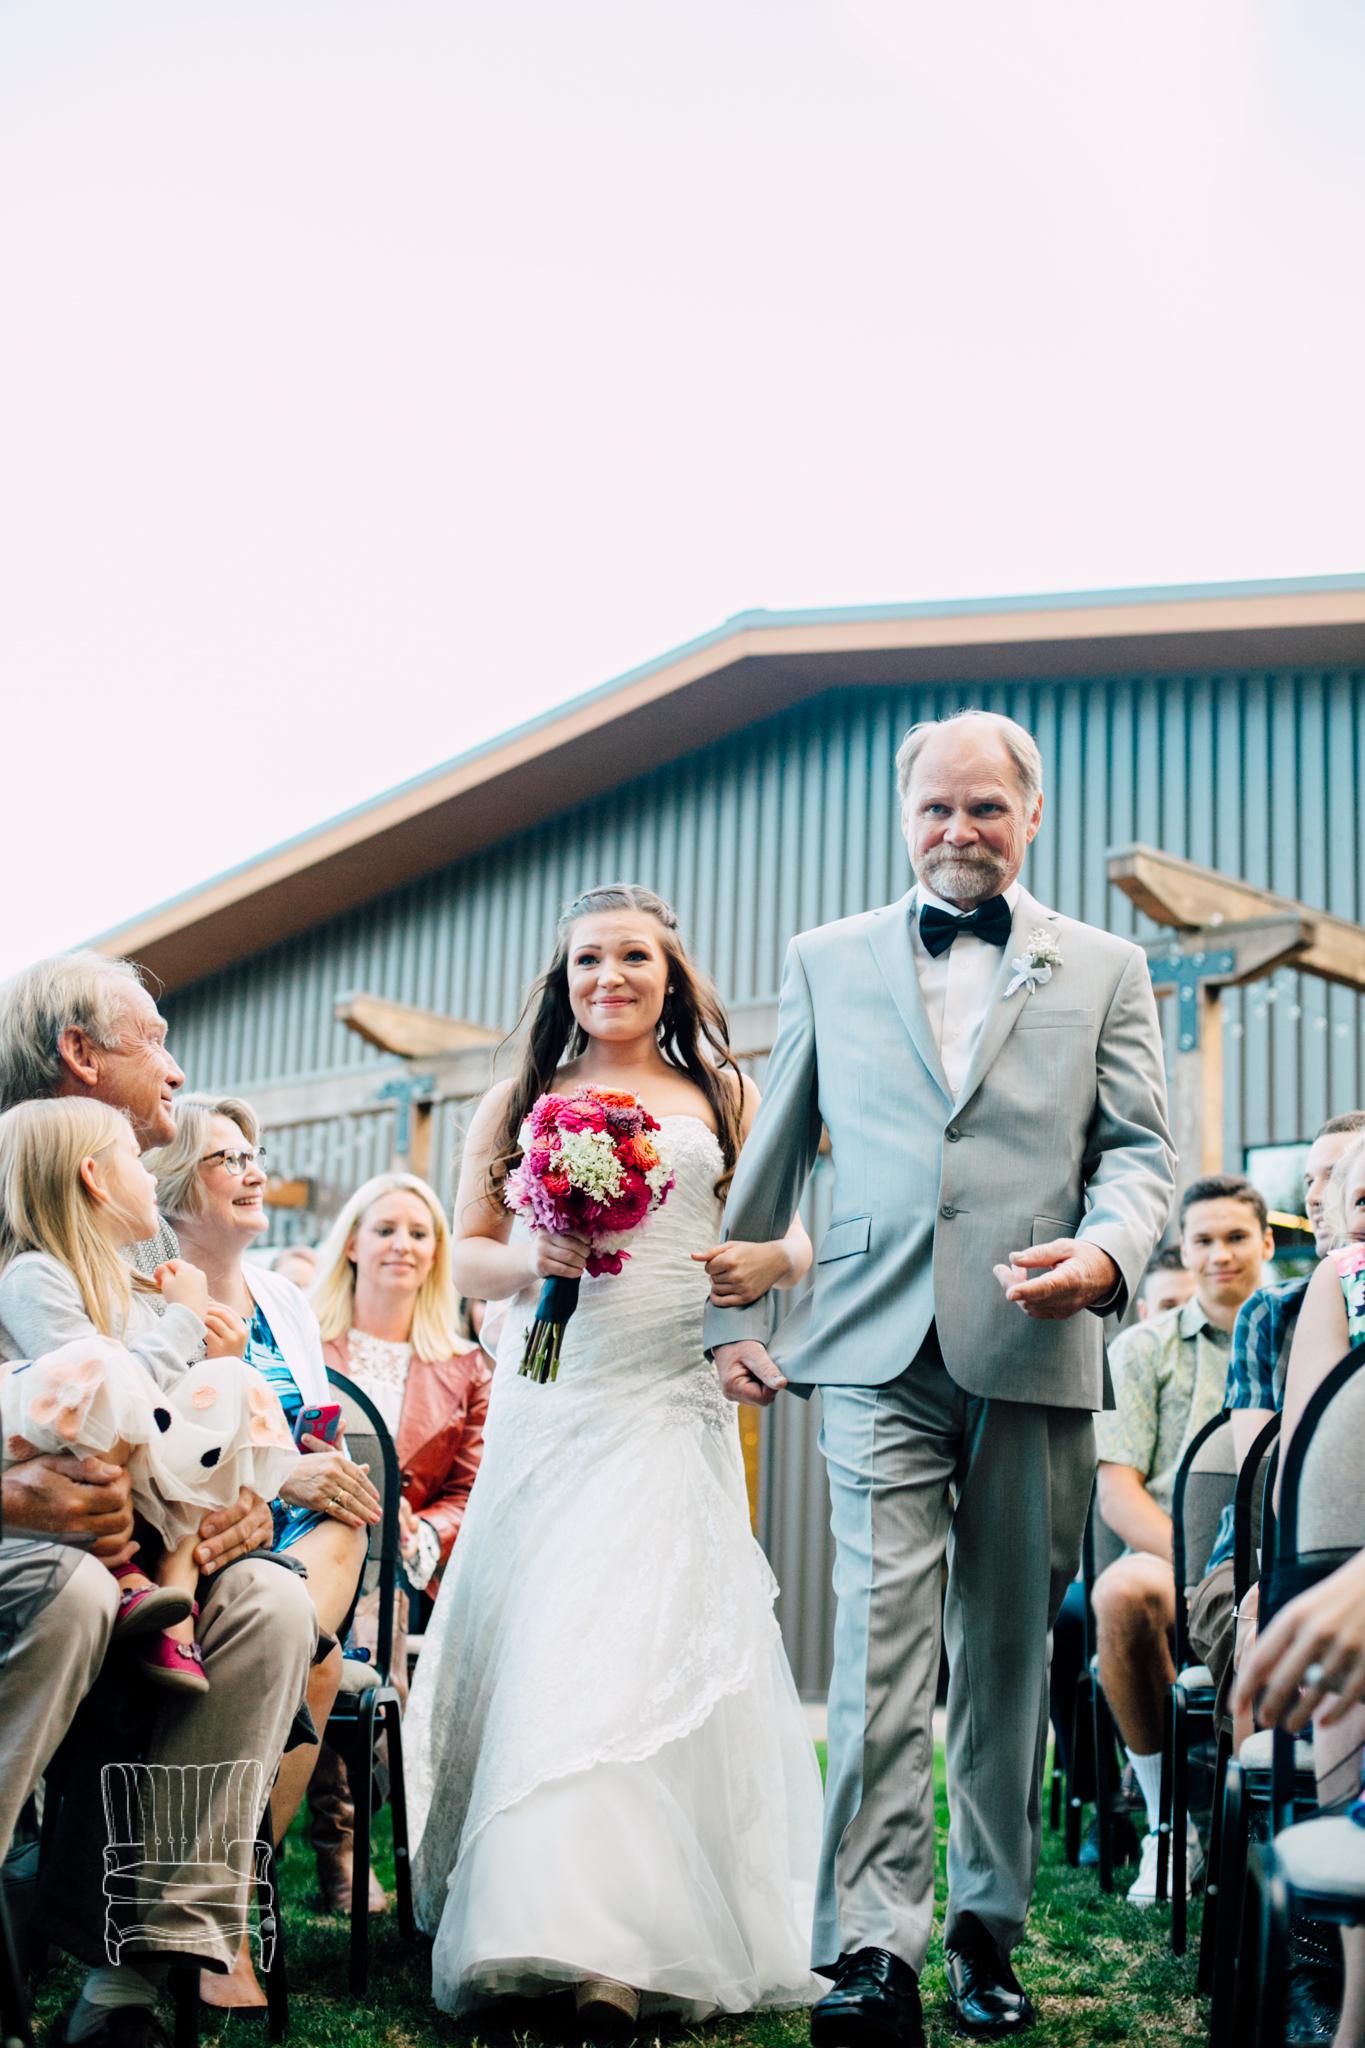 bellingham-washington-wedding-photographer-baker-creek-place-mollee-12.jpg